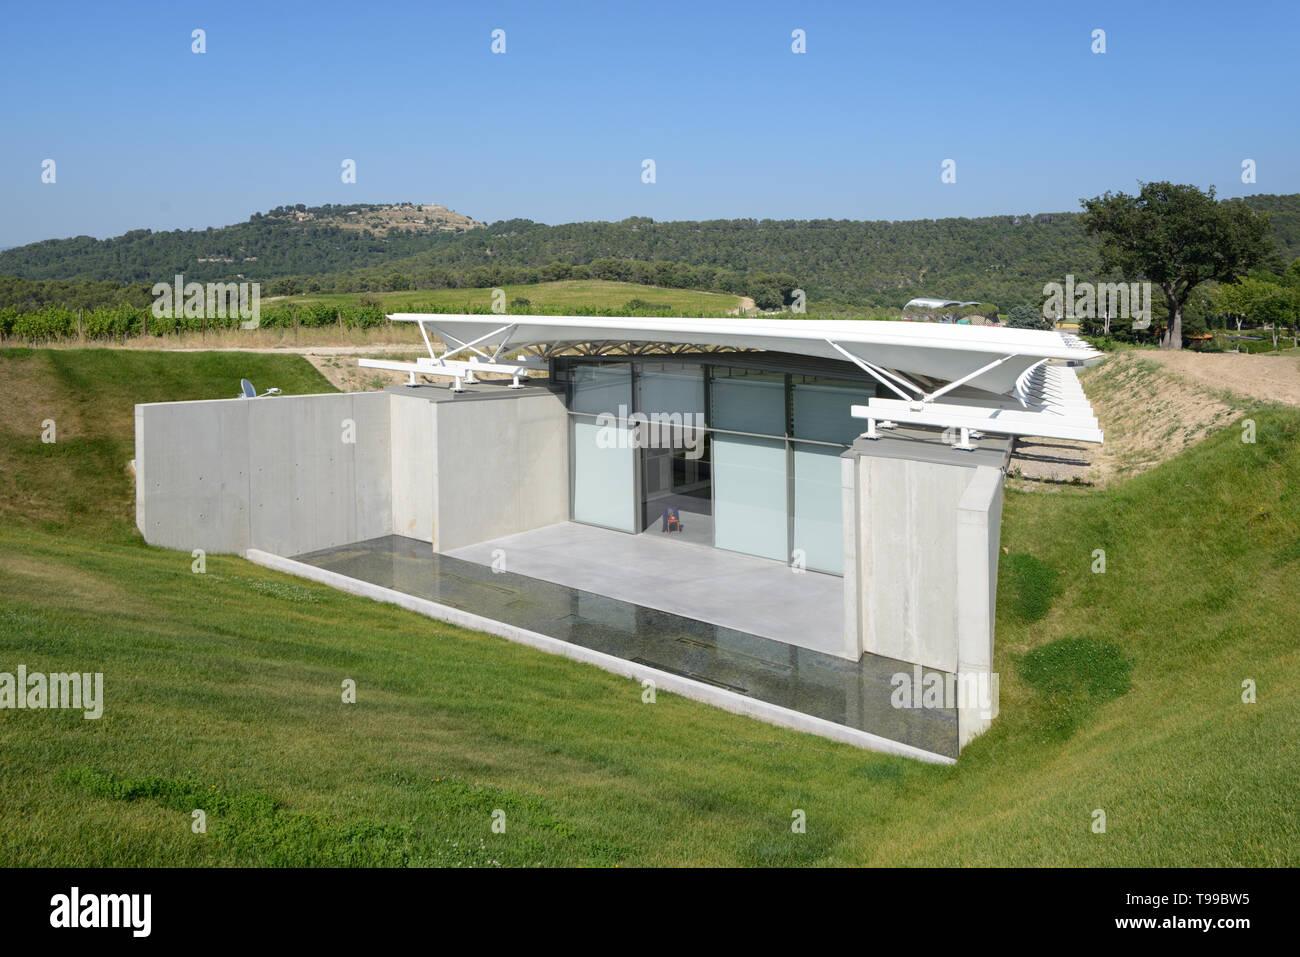 Modernist Exhibition Pavilion by Renzo Piano, built 2017, at the Domaine or Château La Coste at Le Puy-Sainte-Réparade Provence France - Stock Image